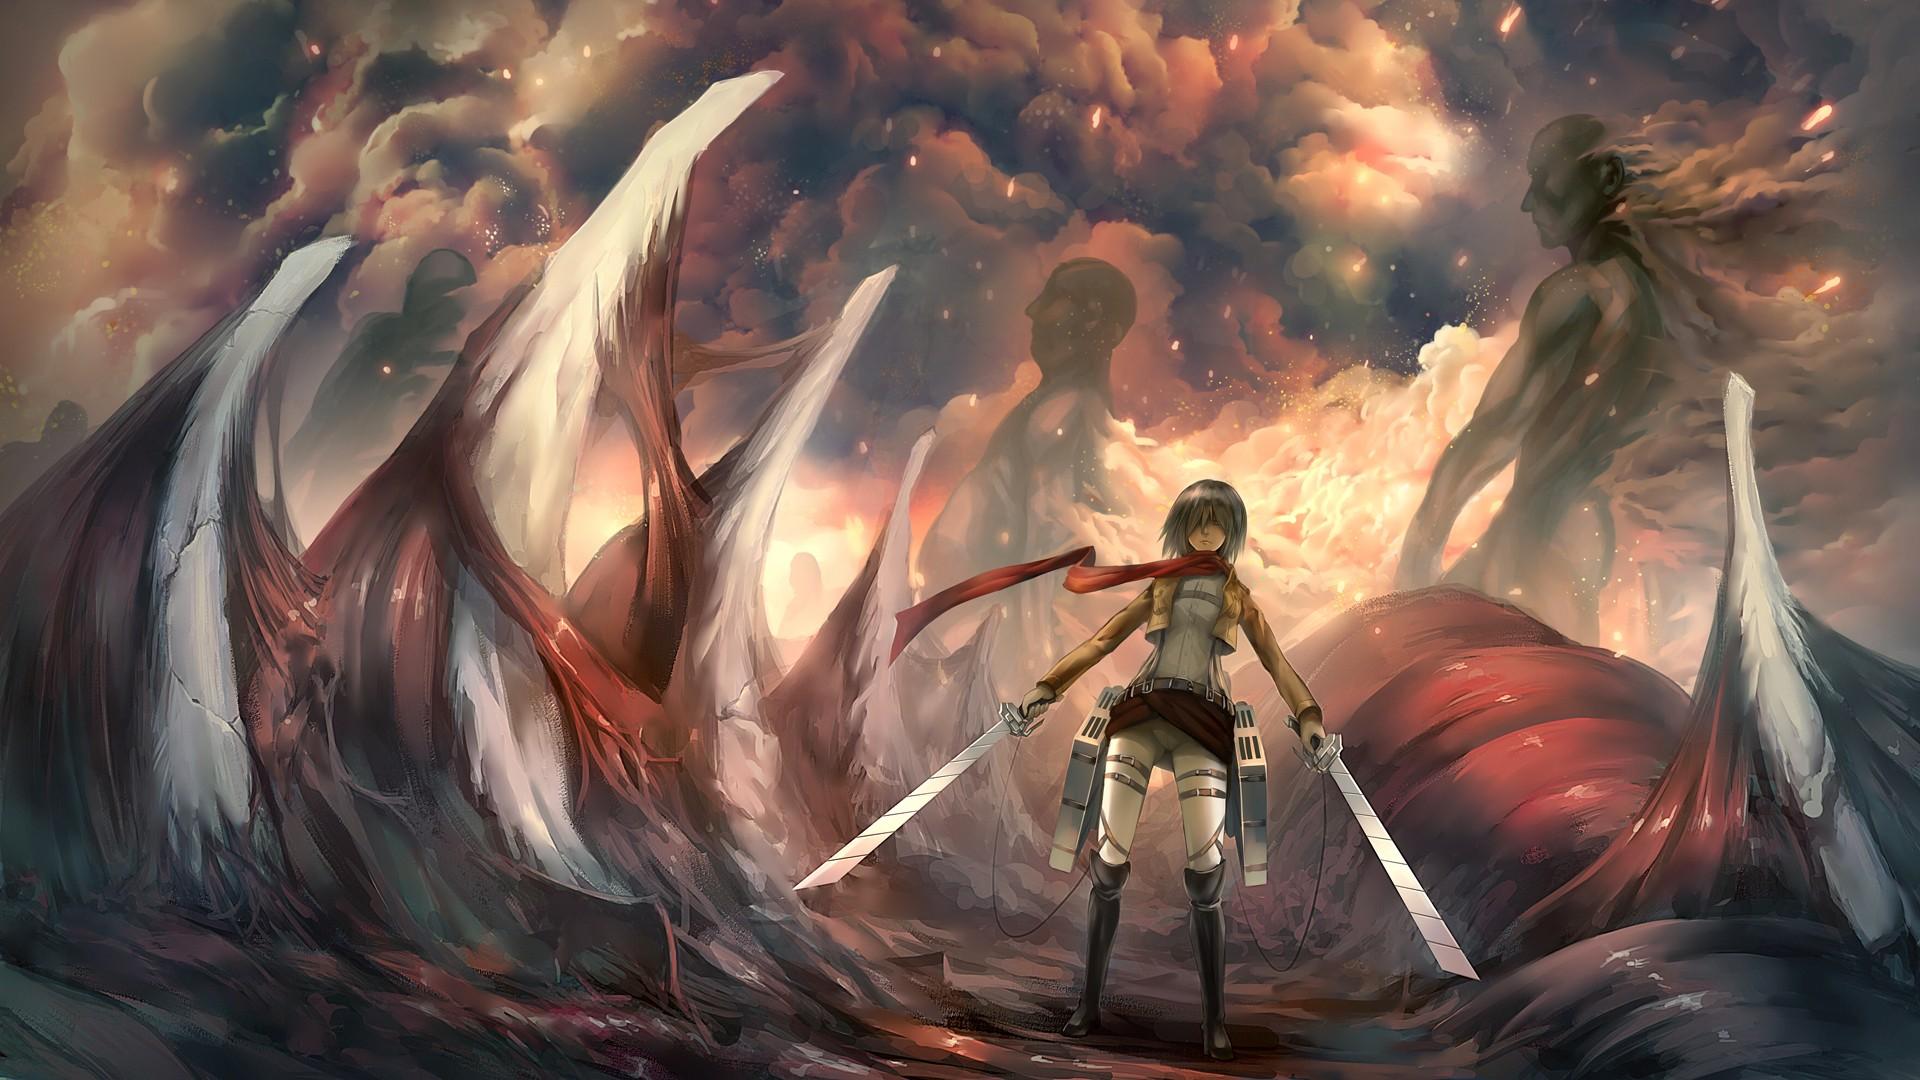 Free Fall Widescreen Wallpaper Attack On Titan Wallpaper For Desktop Pixelstalk Net